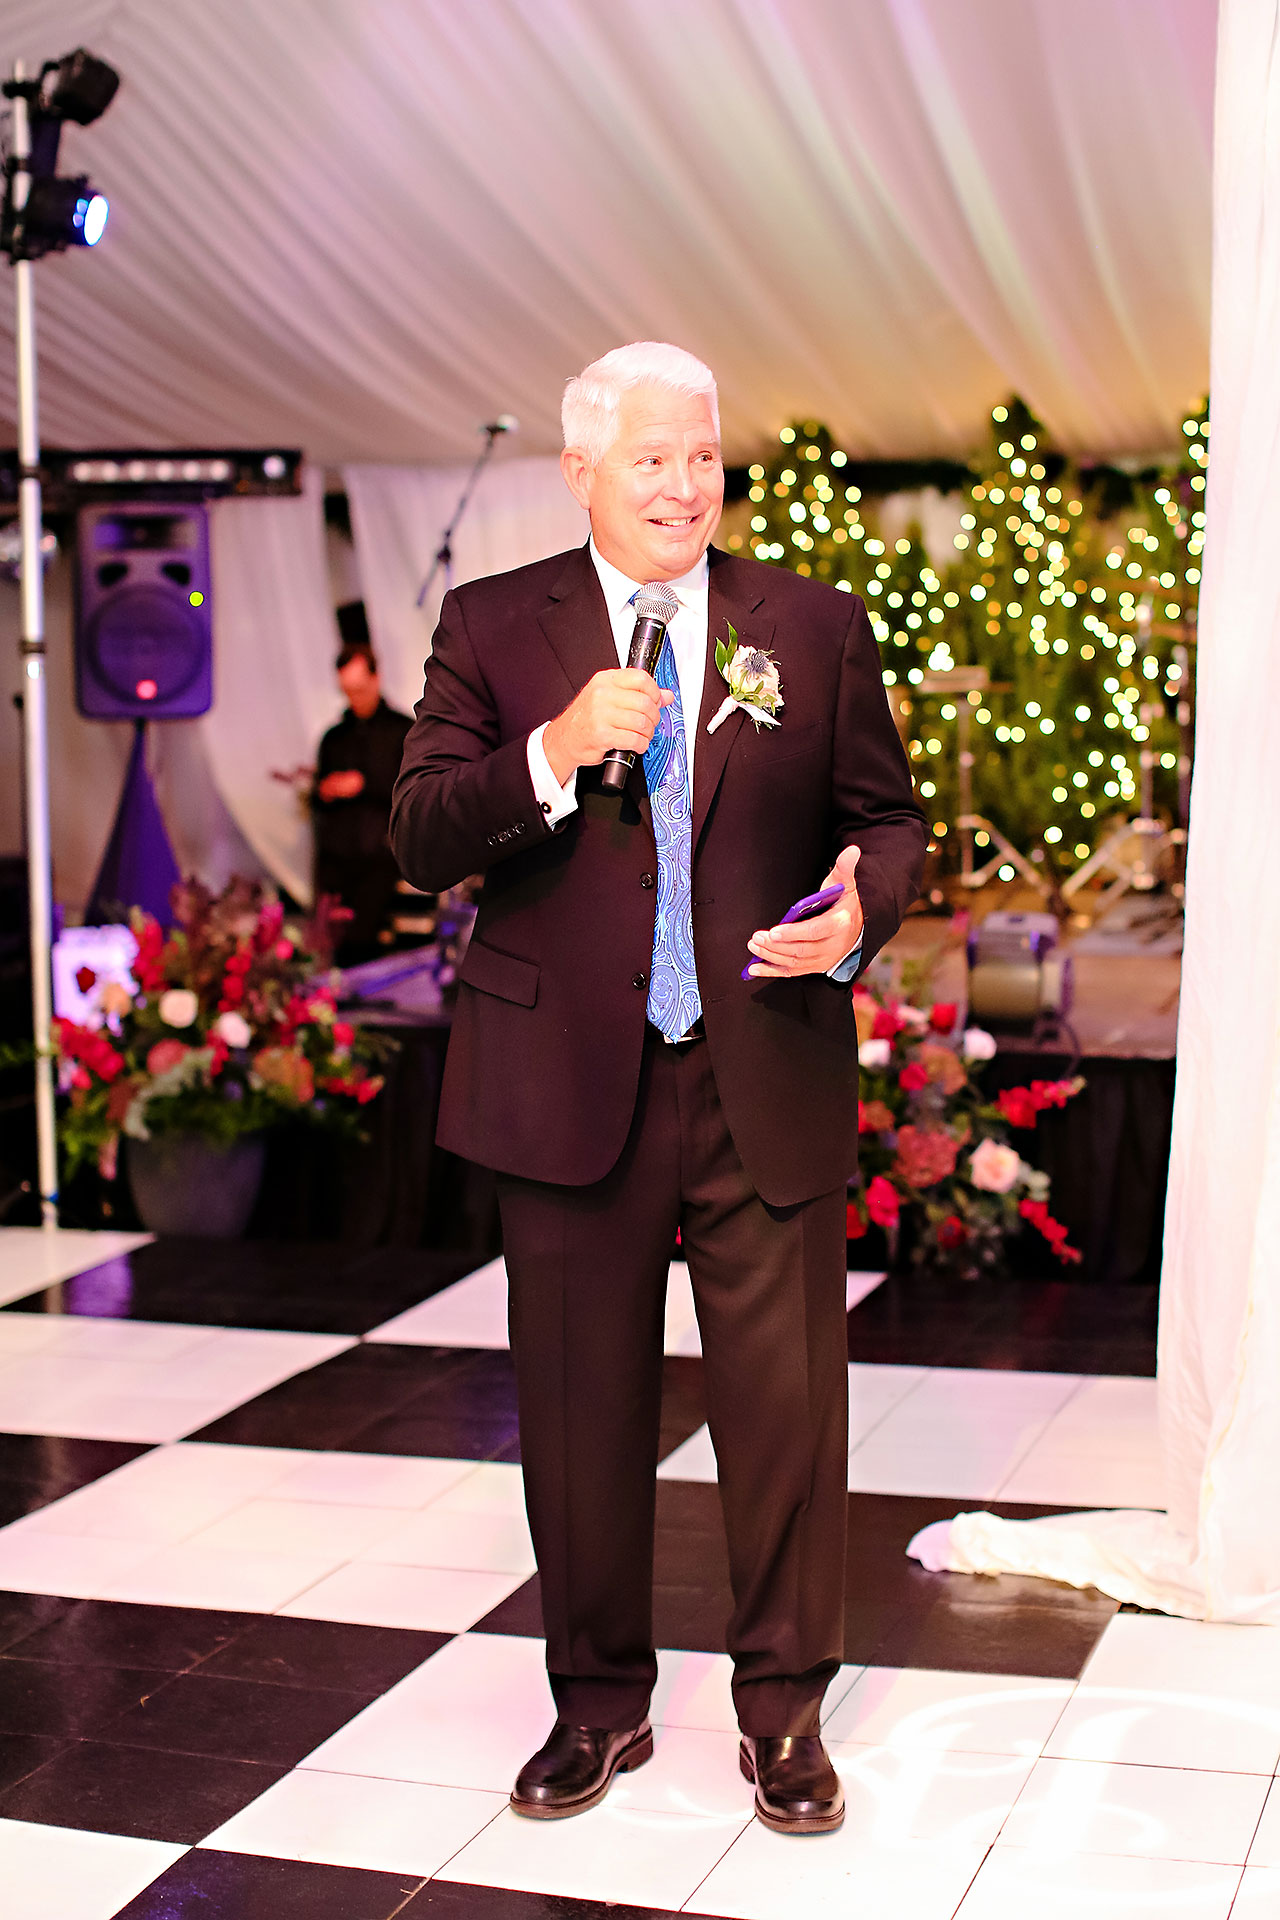 Ashley Steve Bloomington Indiana Wedding 307